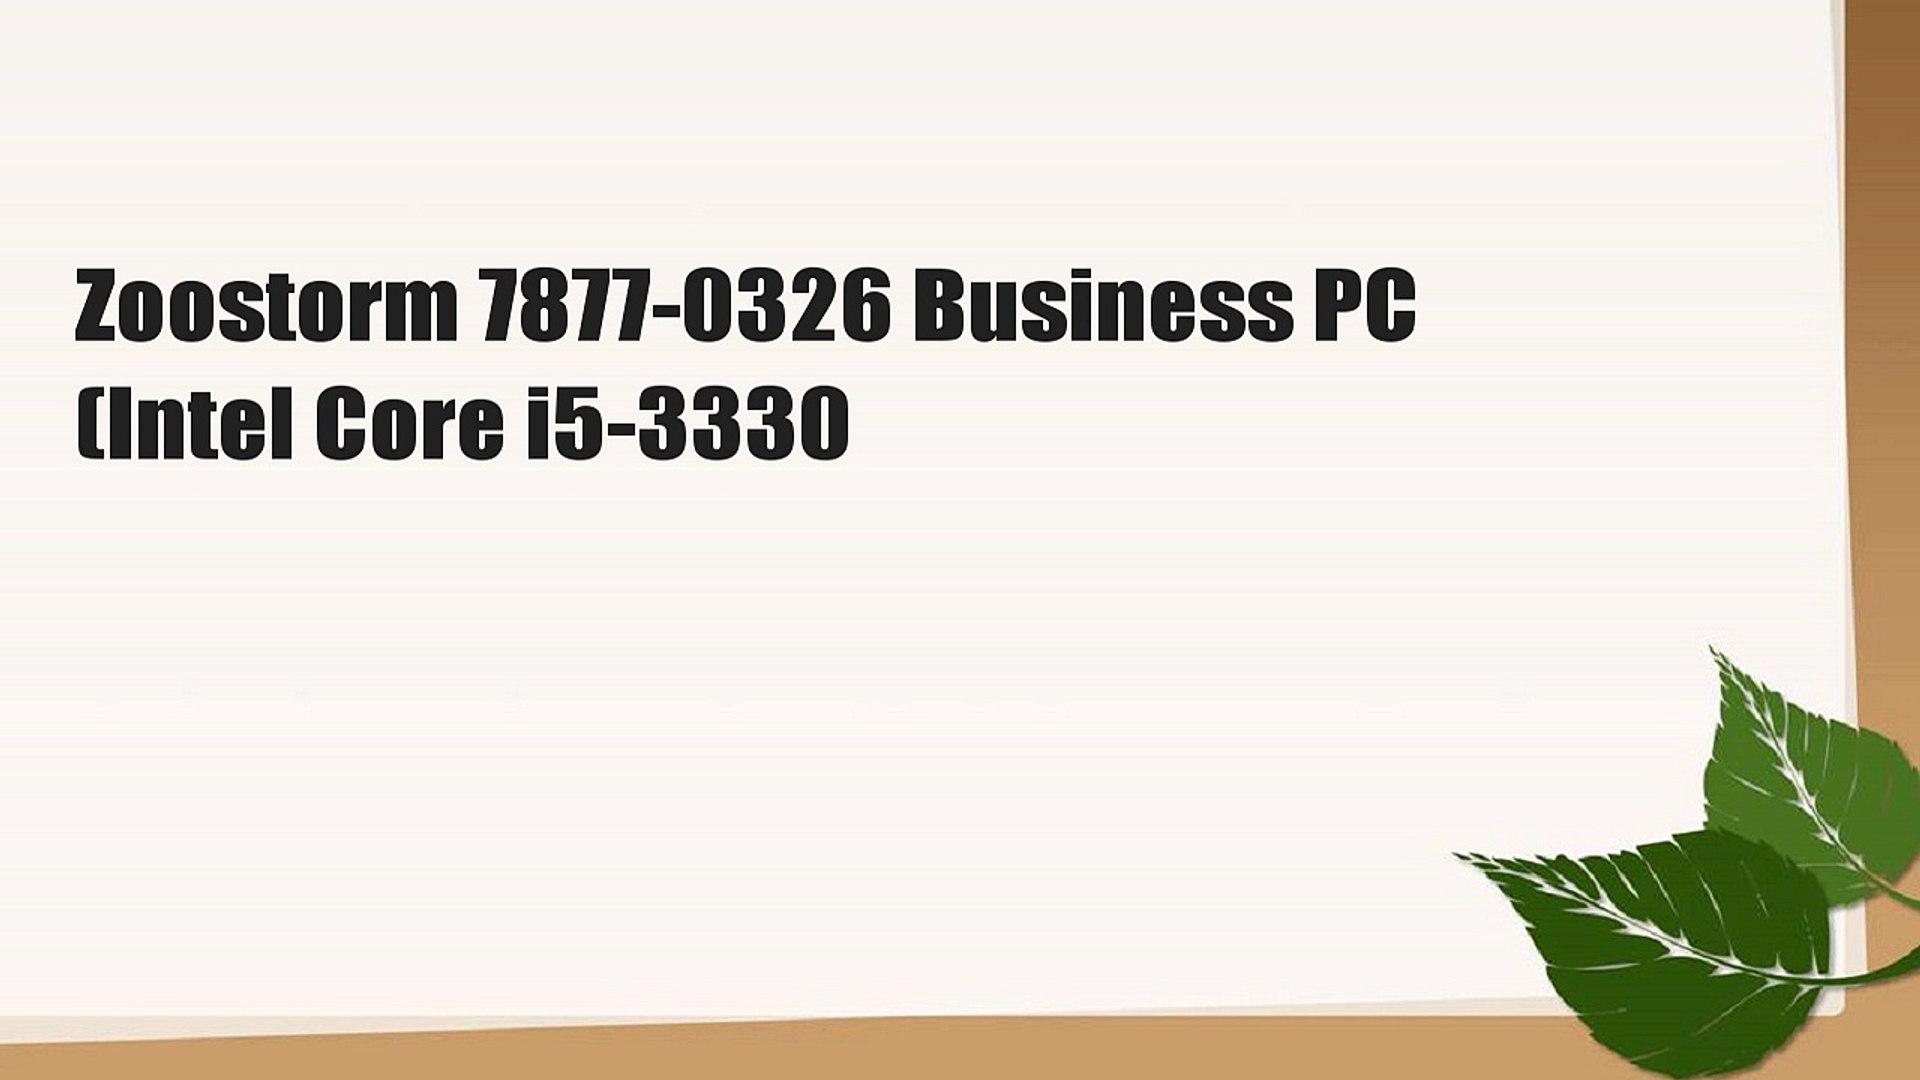 Zoostorm 7877-0326 Business PC (Intel Core i5-3330